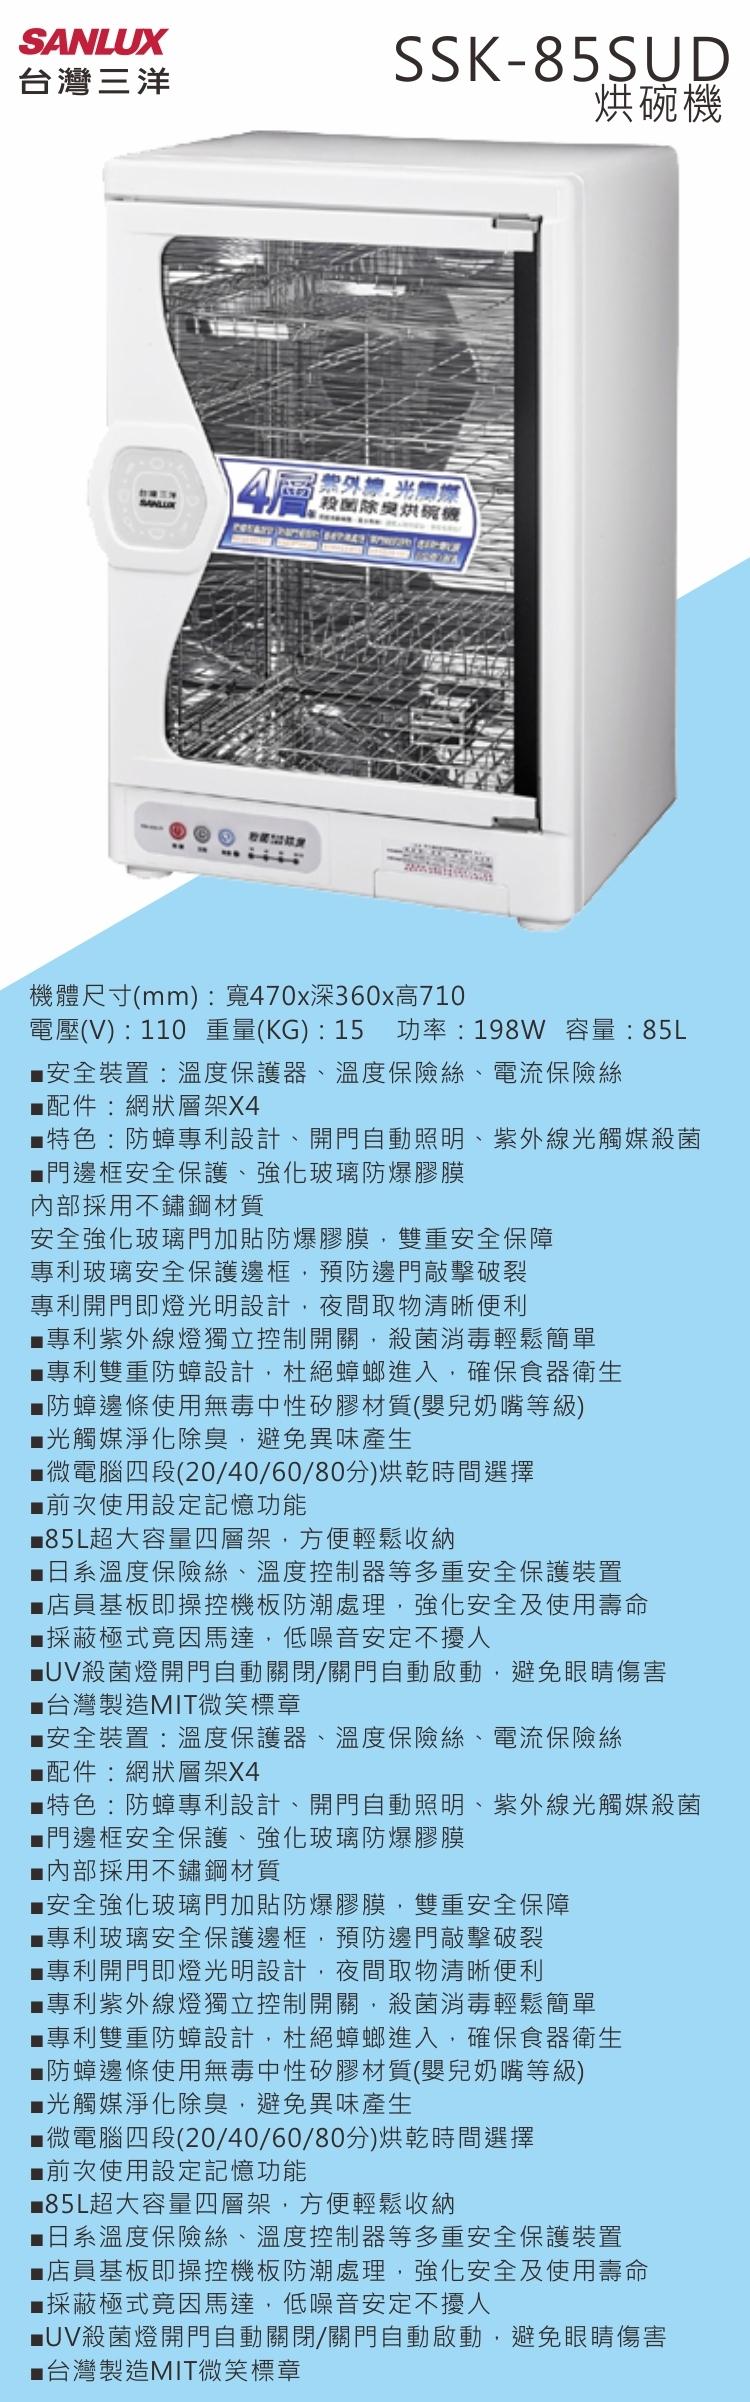 SANLUX 台灣三洋 SSK-85SUD 烘碗機 微電腦4段控溫 光觸媒淨化除臭(台灣製造)